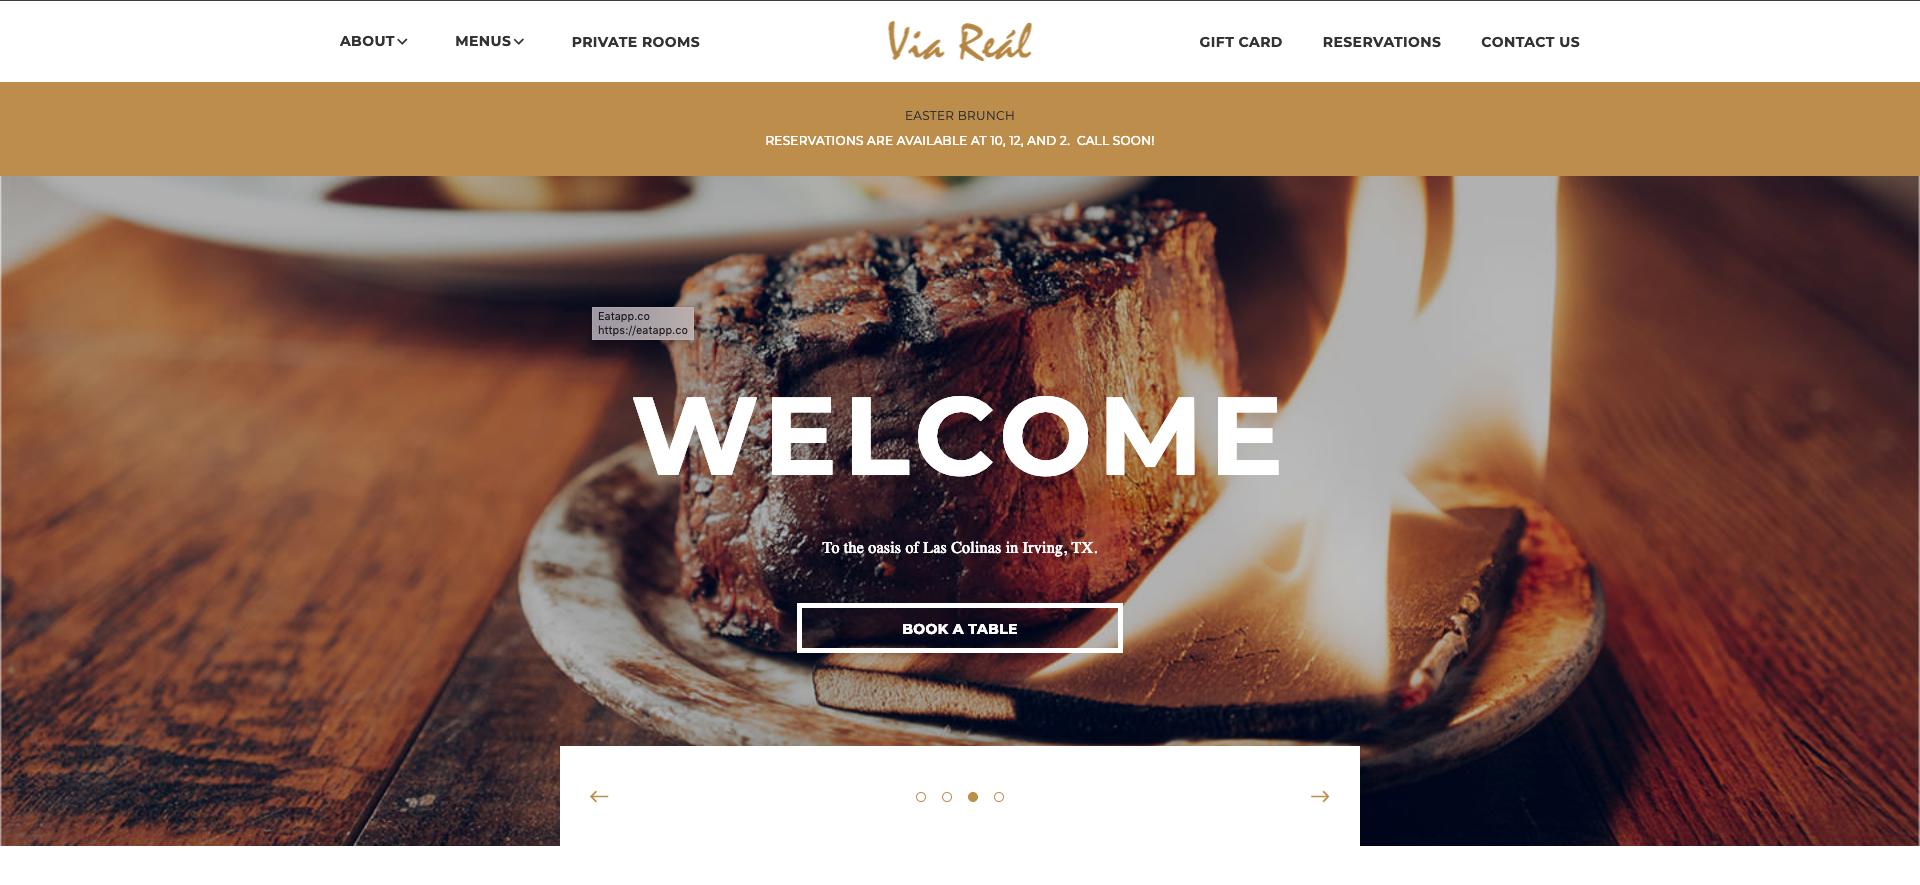 Via Real Restaurant Website Design